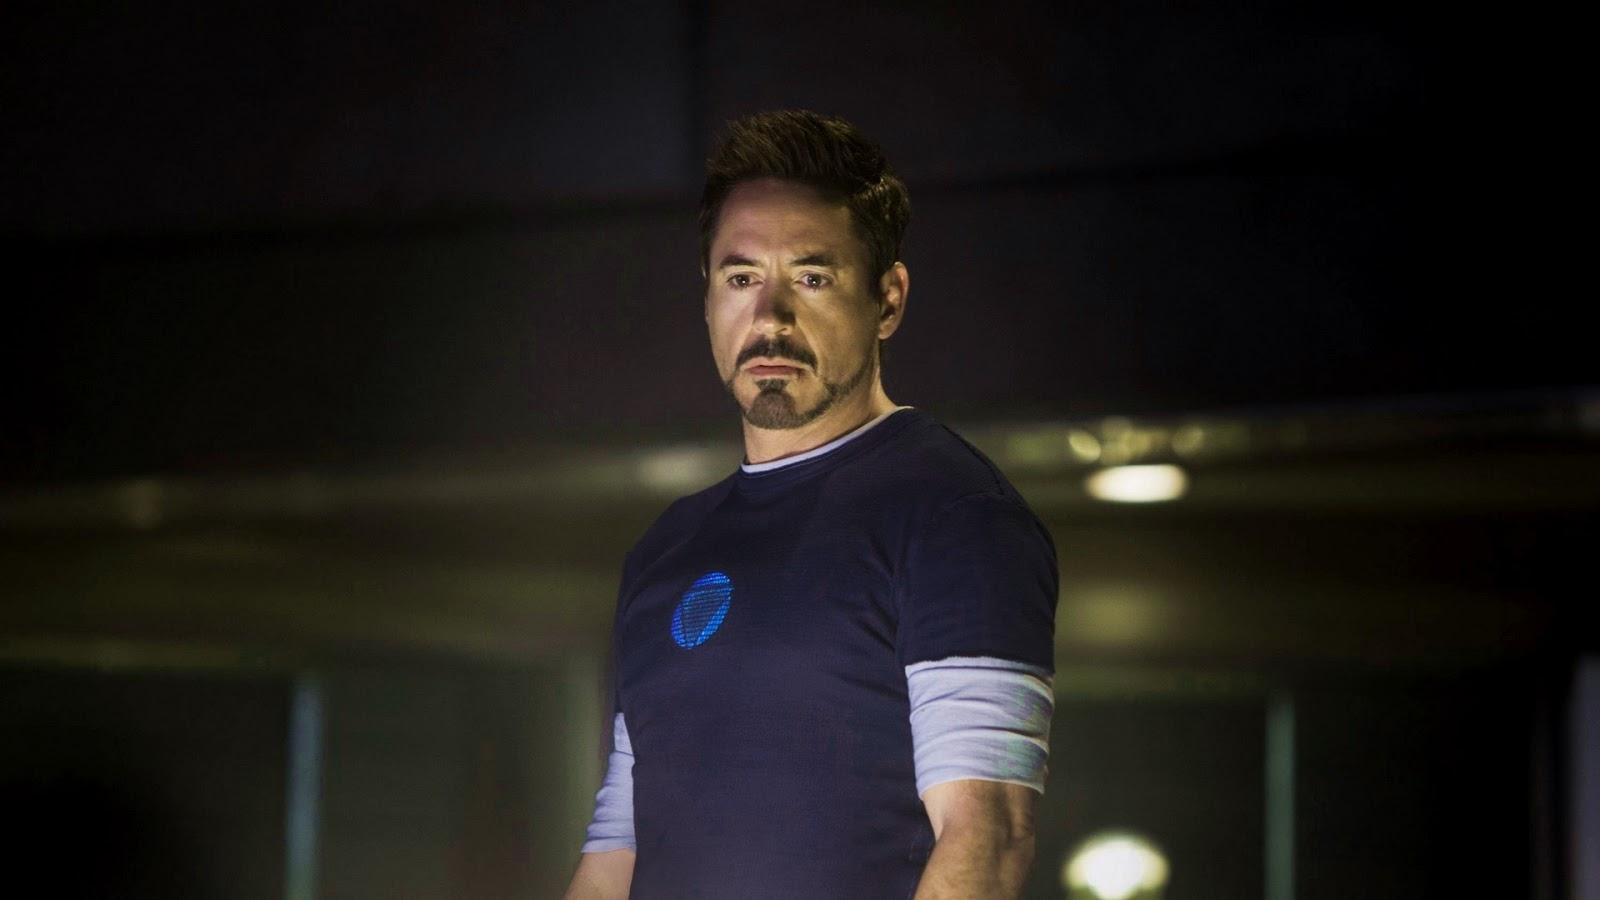 Iron Man 3 Robert Downey Jr 1920x1080 Wallpapers Full Hd